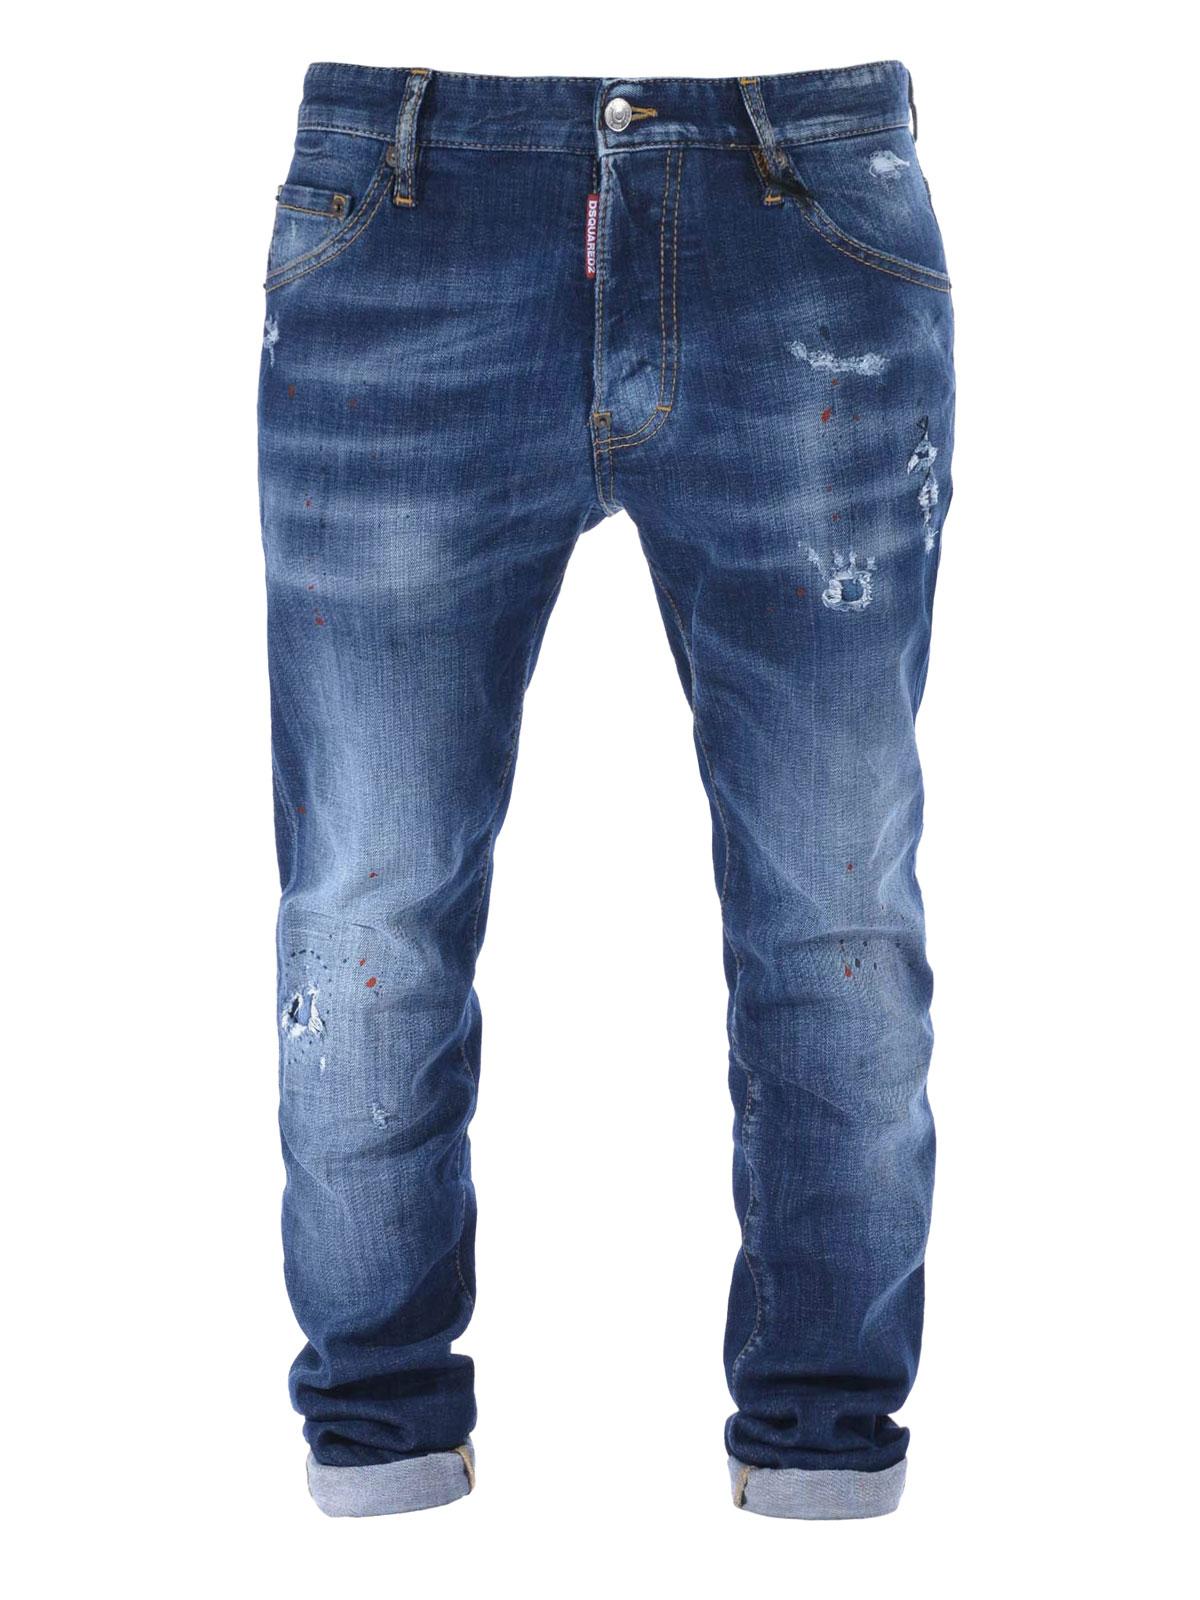 Straight Fit Jeans Women